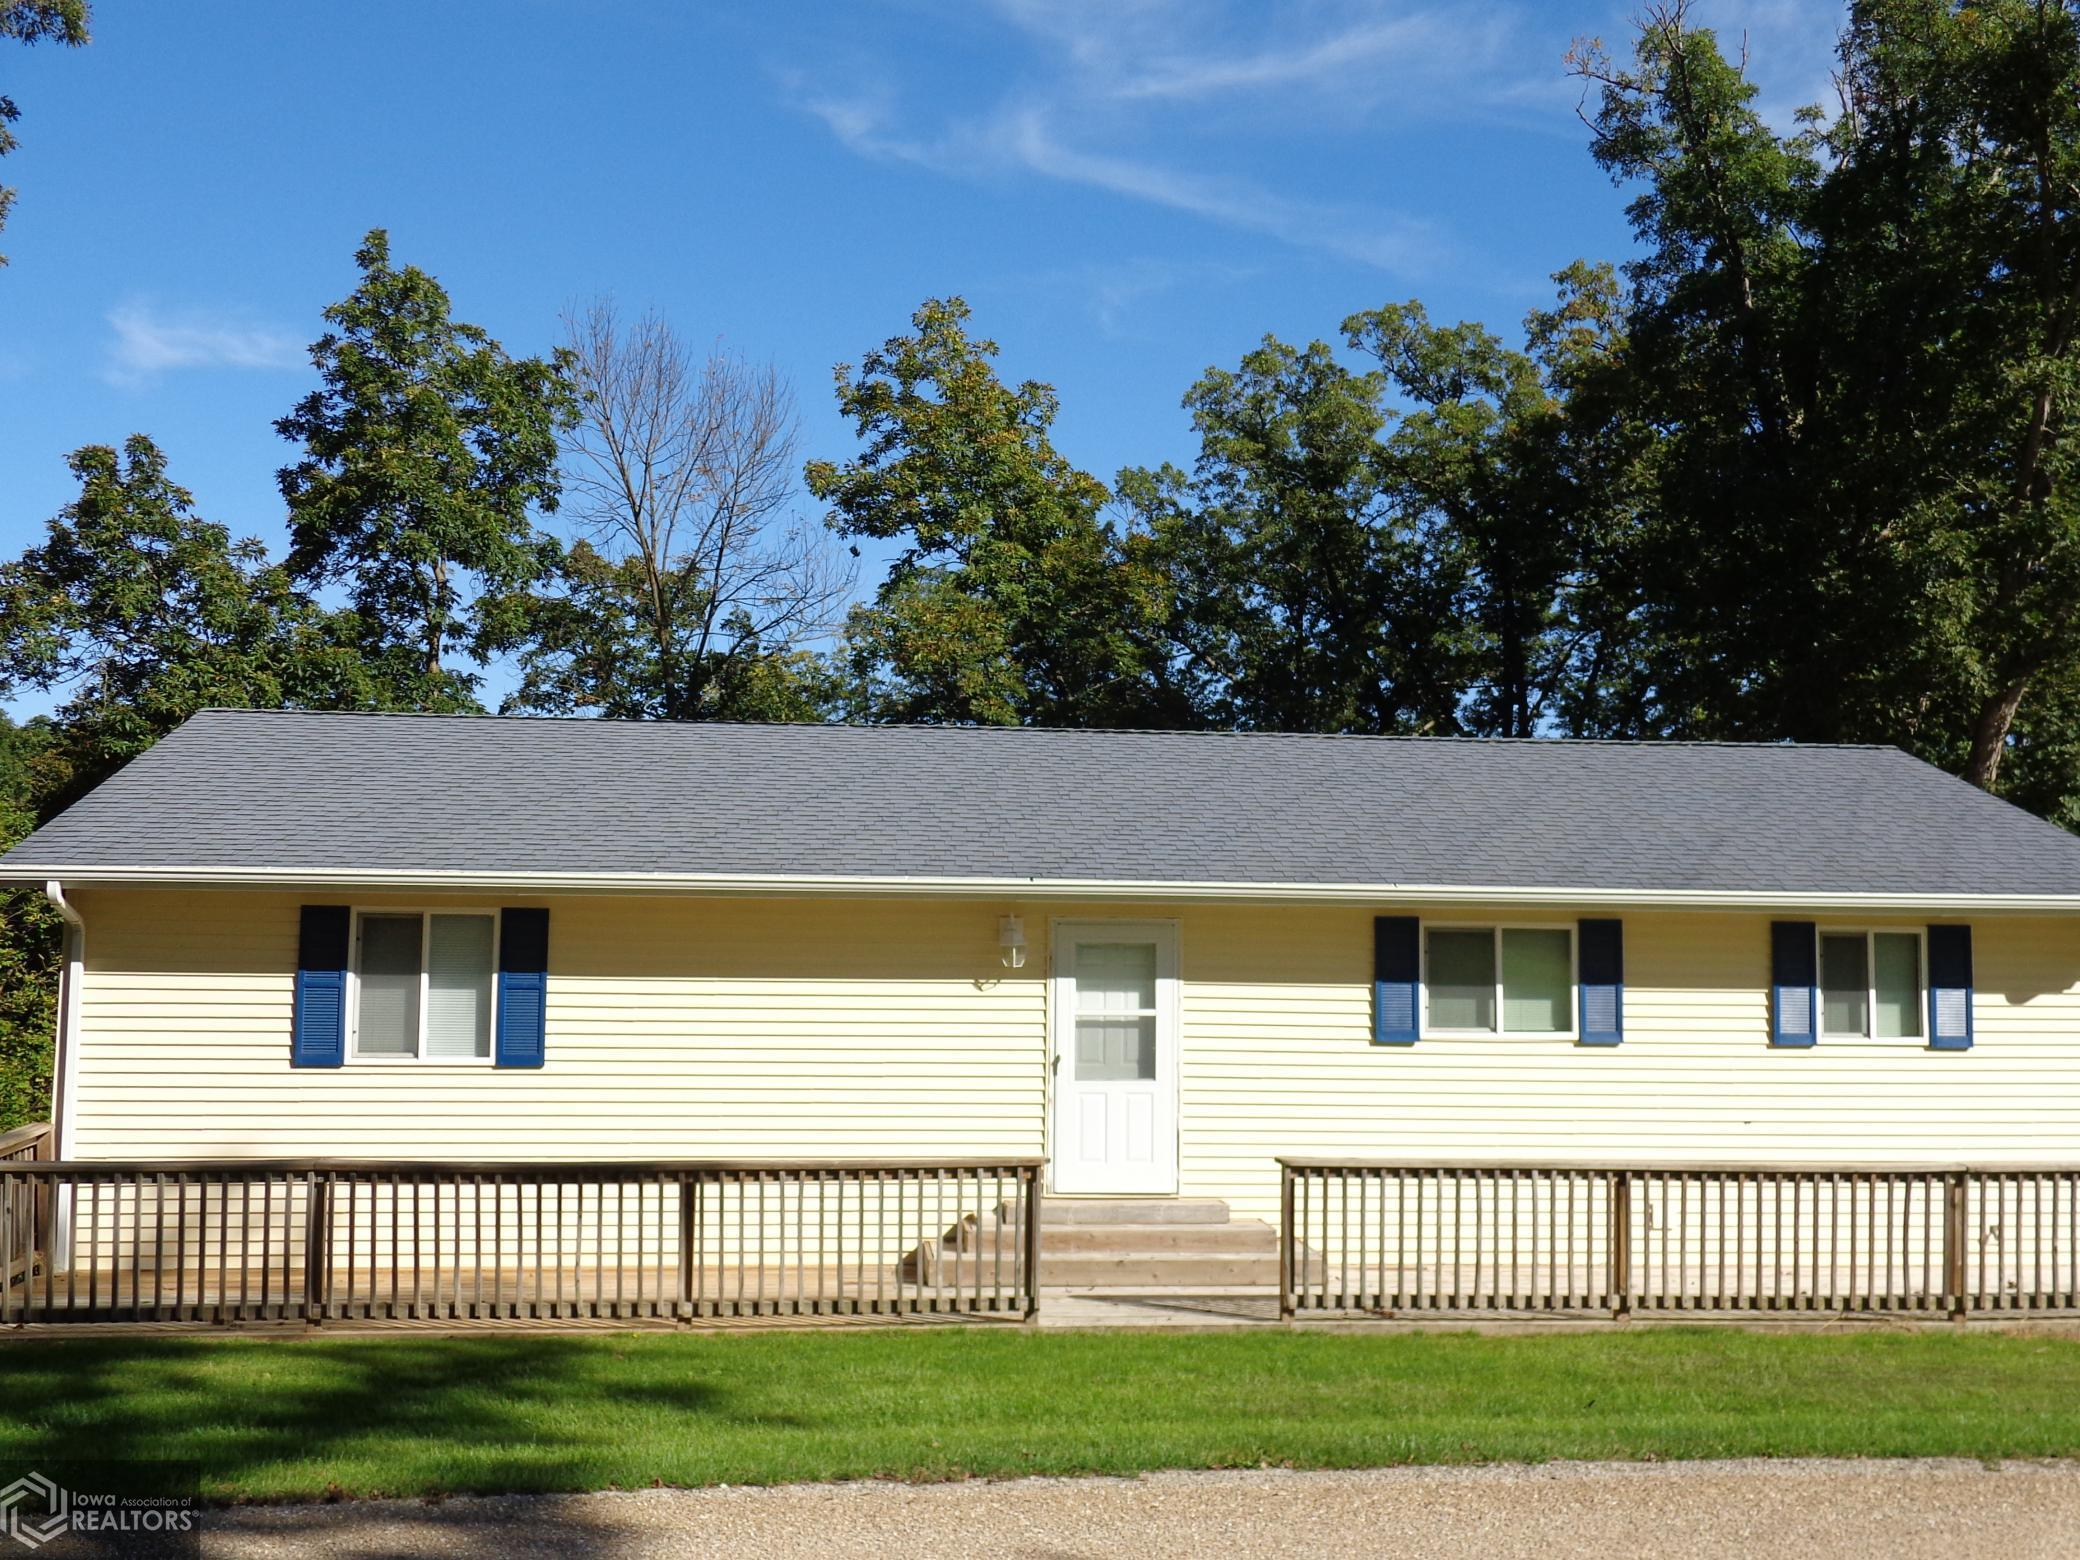 3175 Barbara, Brooklyn, Iowa 52211, 2 Bedrooms Bedrooms, ,1 BathroomBathrooms,Single Family,For Sale,Barbara,6018617